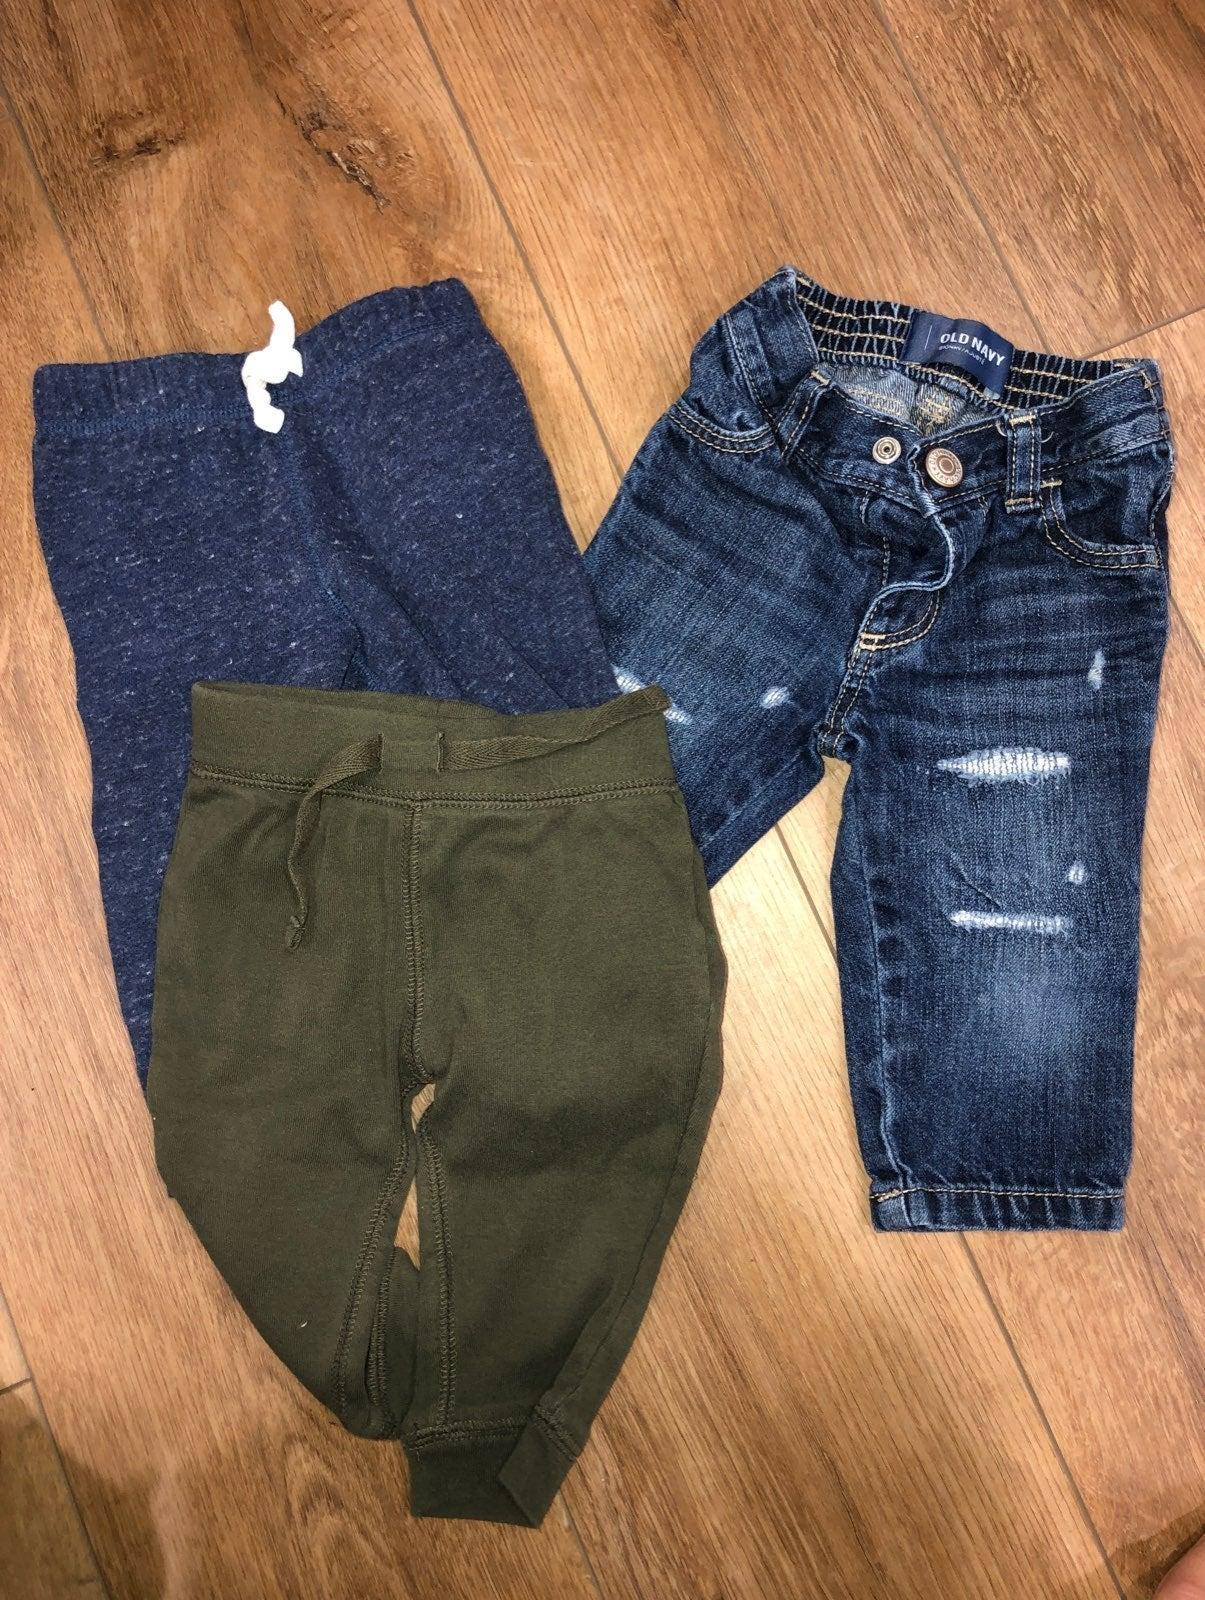 3 pair baby pants